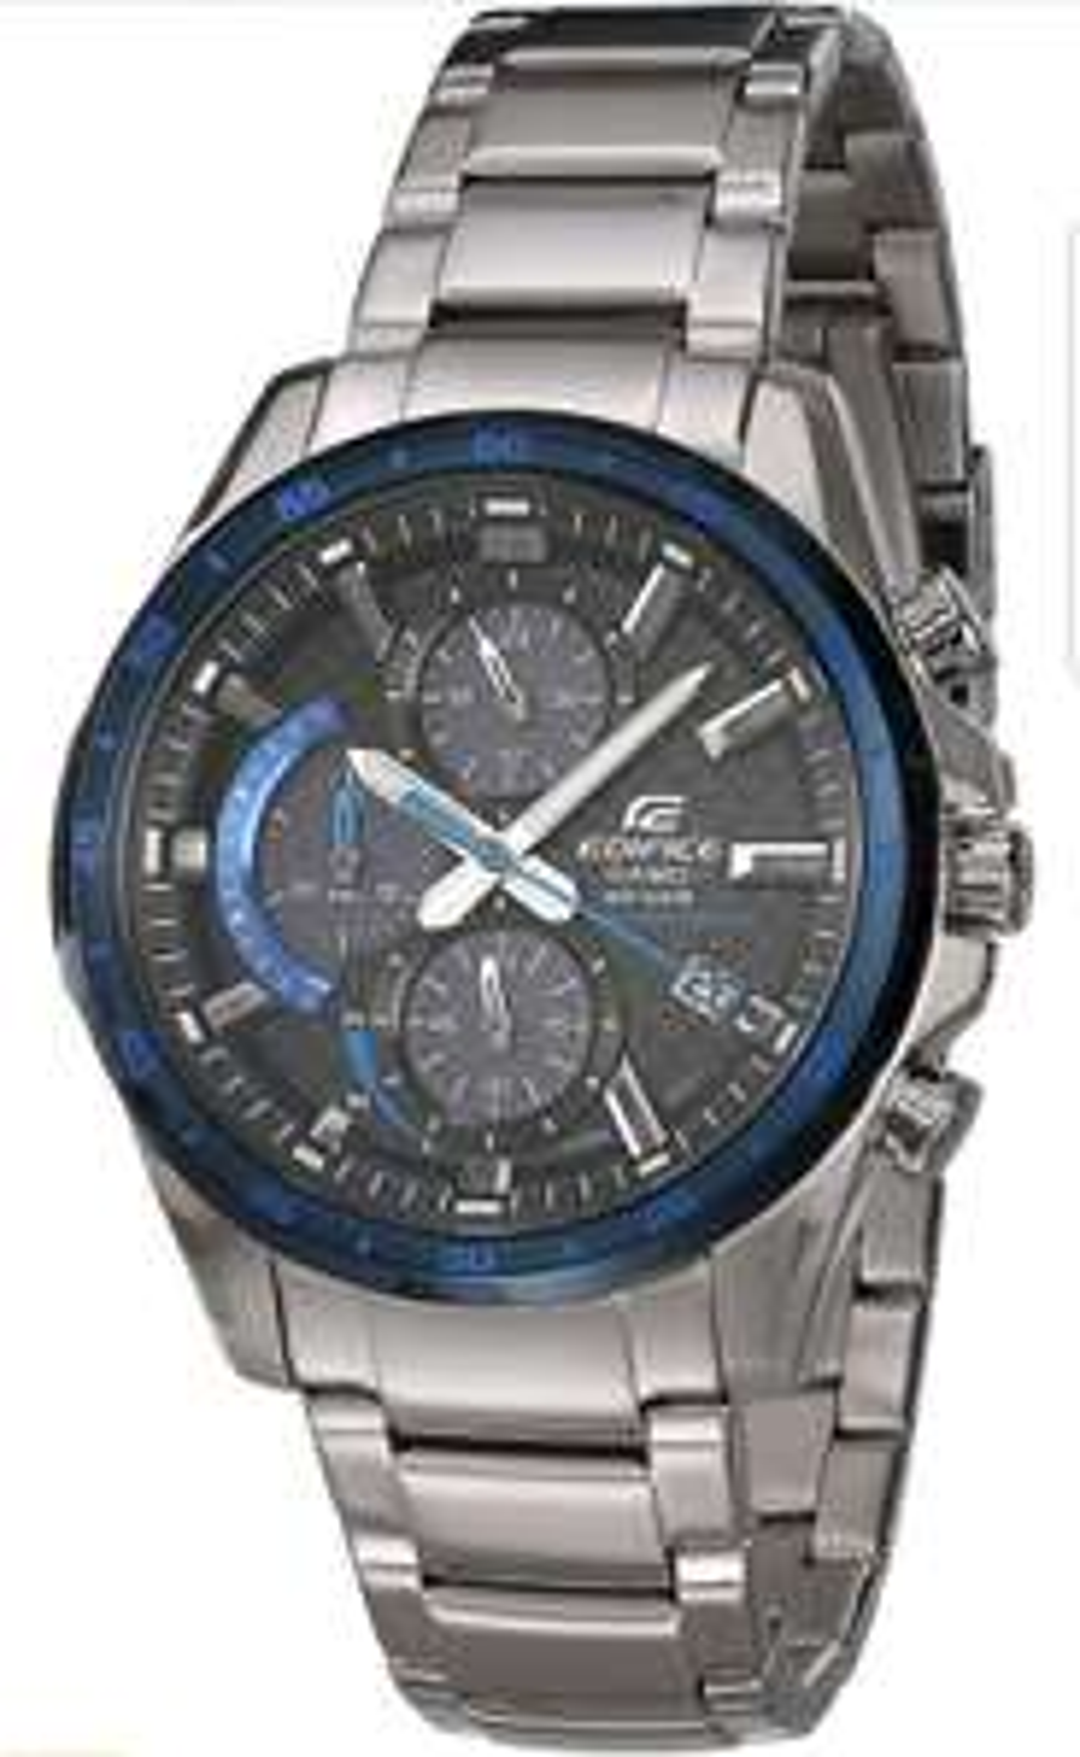 Amazon, Reloj Casio Edifice para Hombres 46mm, pulsera de Acero Inoxidable (Touch Solar)